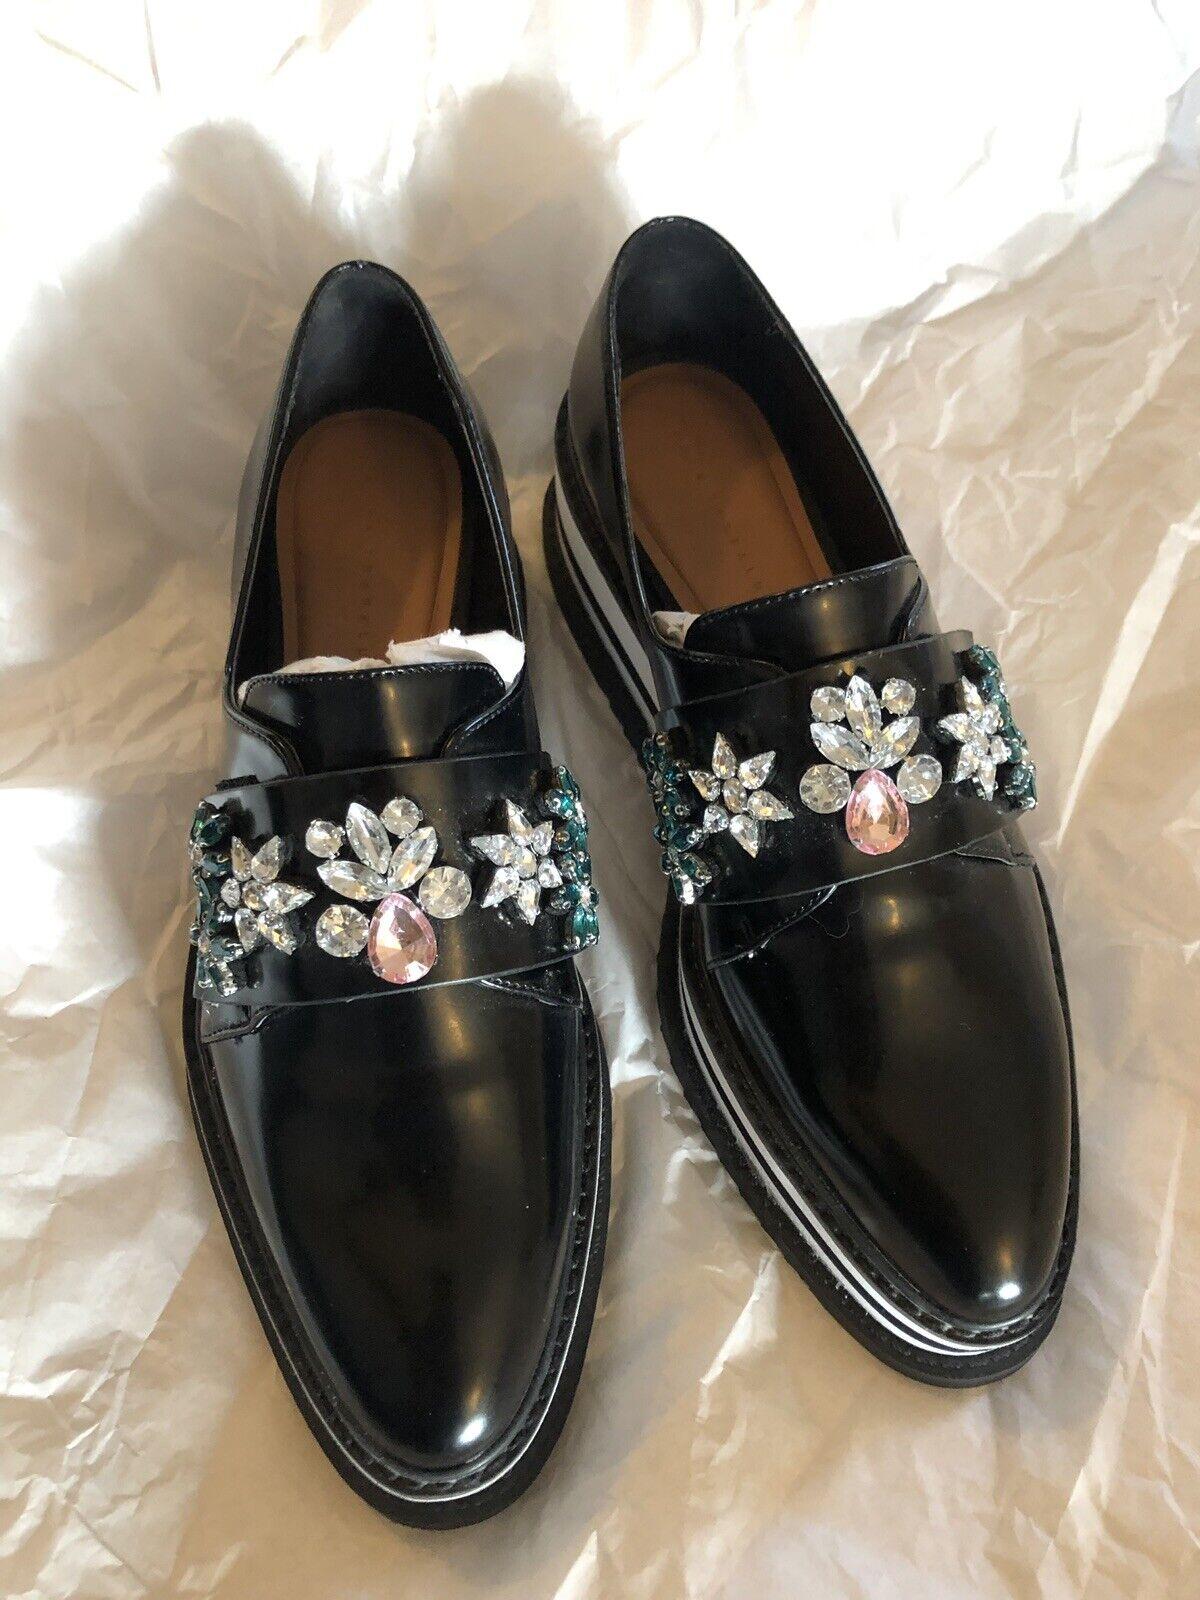 Zara Trafaluc Black Sparkly Bead Black White & Wedge Brogue Loafer Shoes,6/39